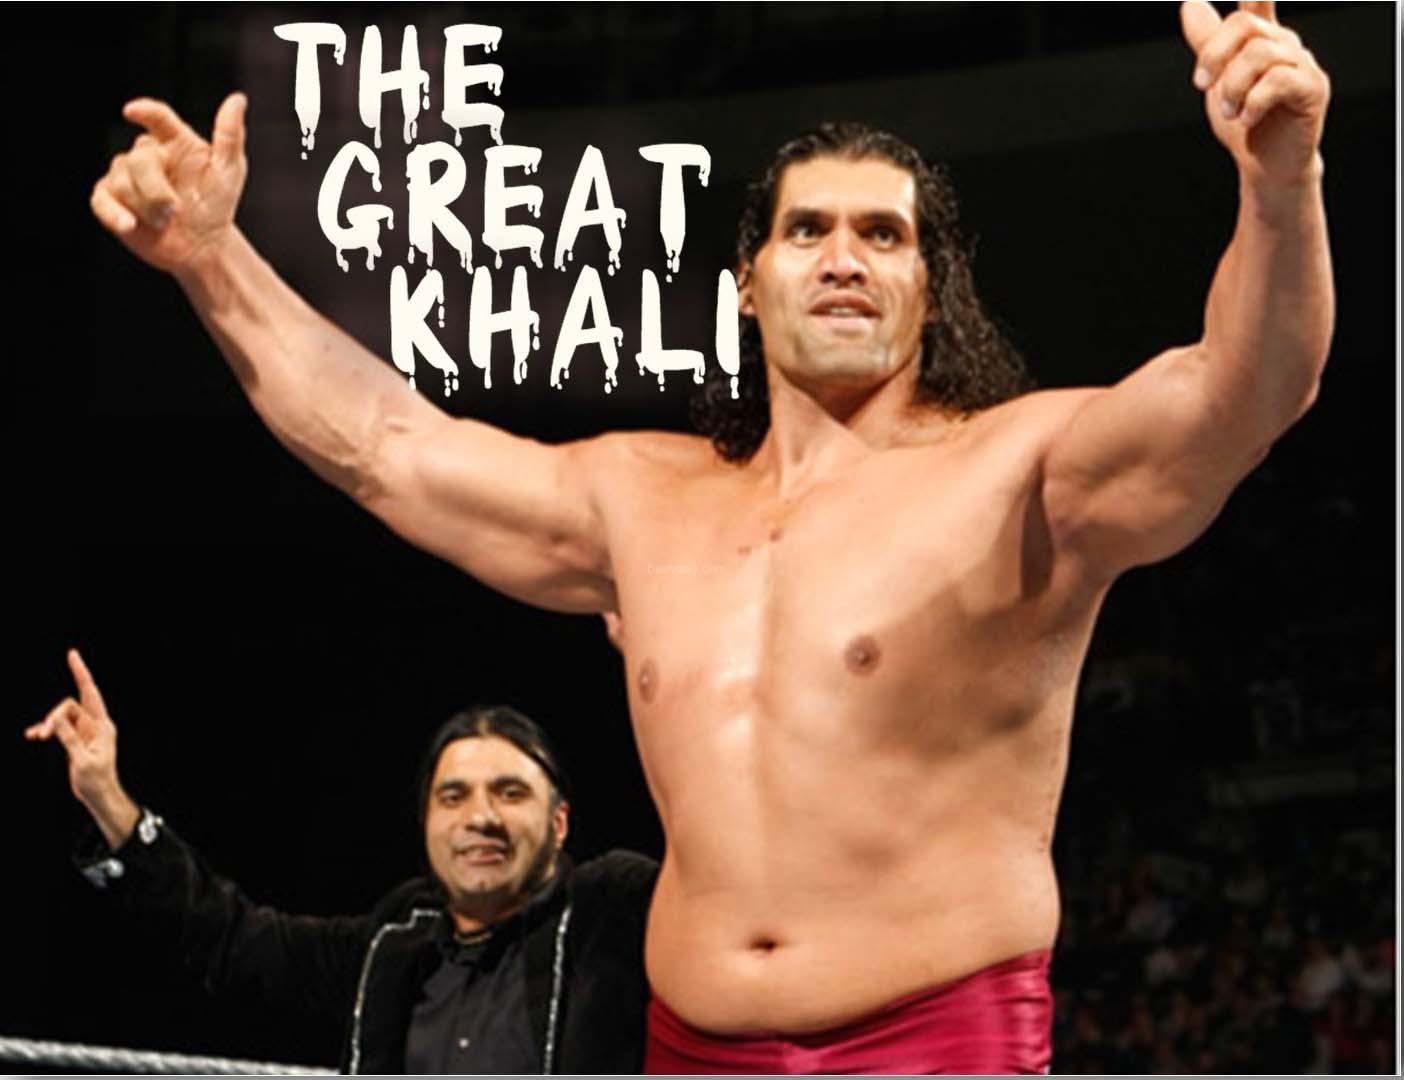 Wwe The Great Khalis Hd Wallpaper Latestwallpaper99